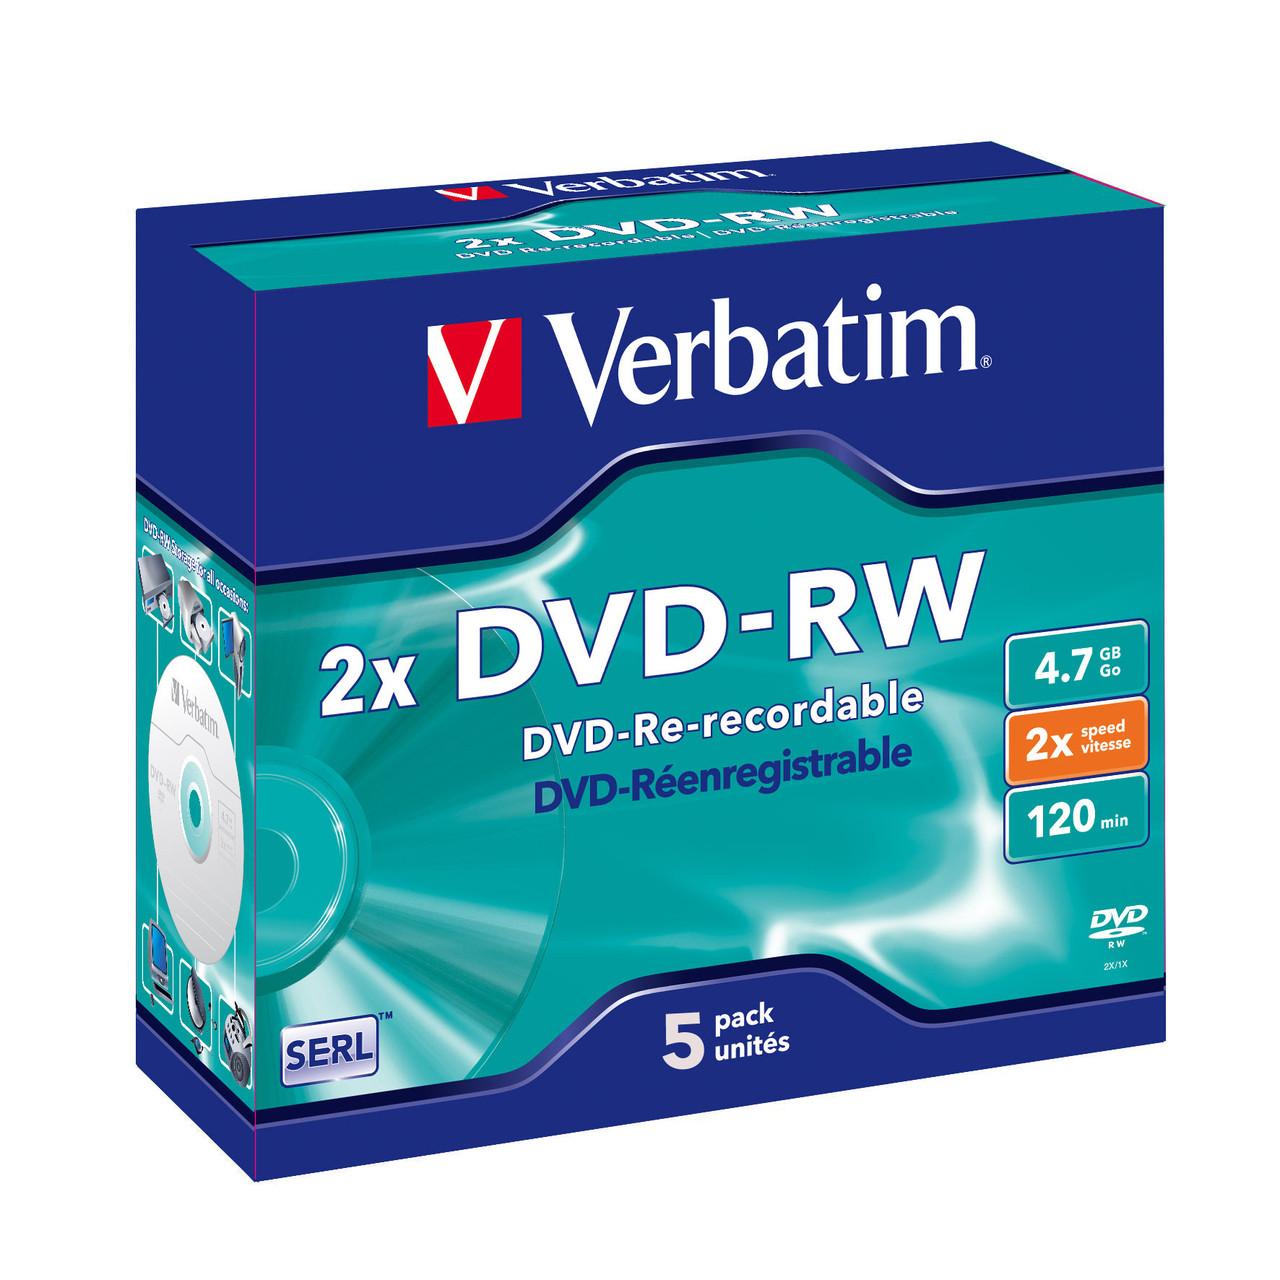 Verbatim DVD-RW - 4.7GB Jewel Case 2x (1 Pack of 5 Pieces)